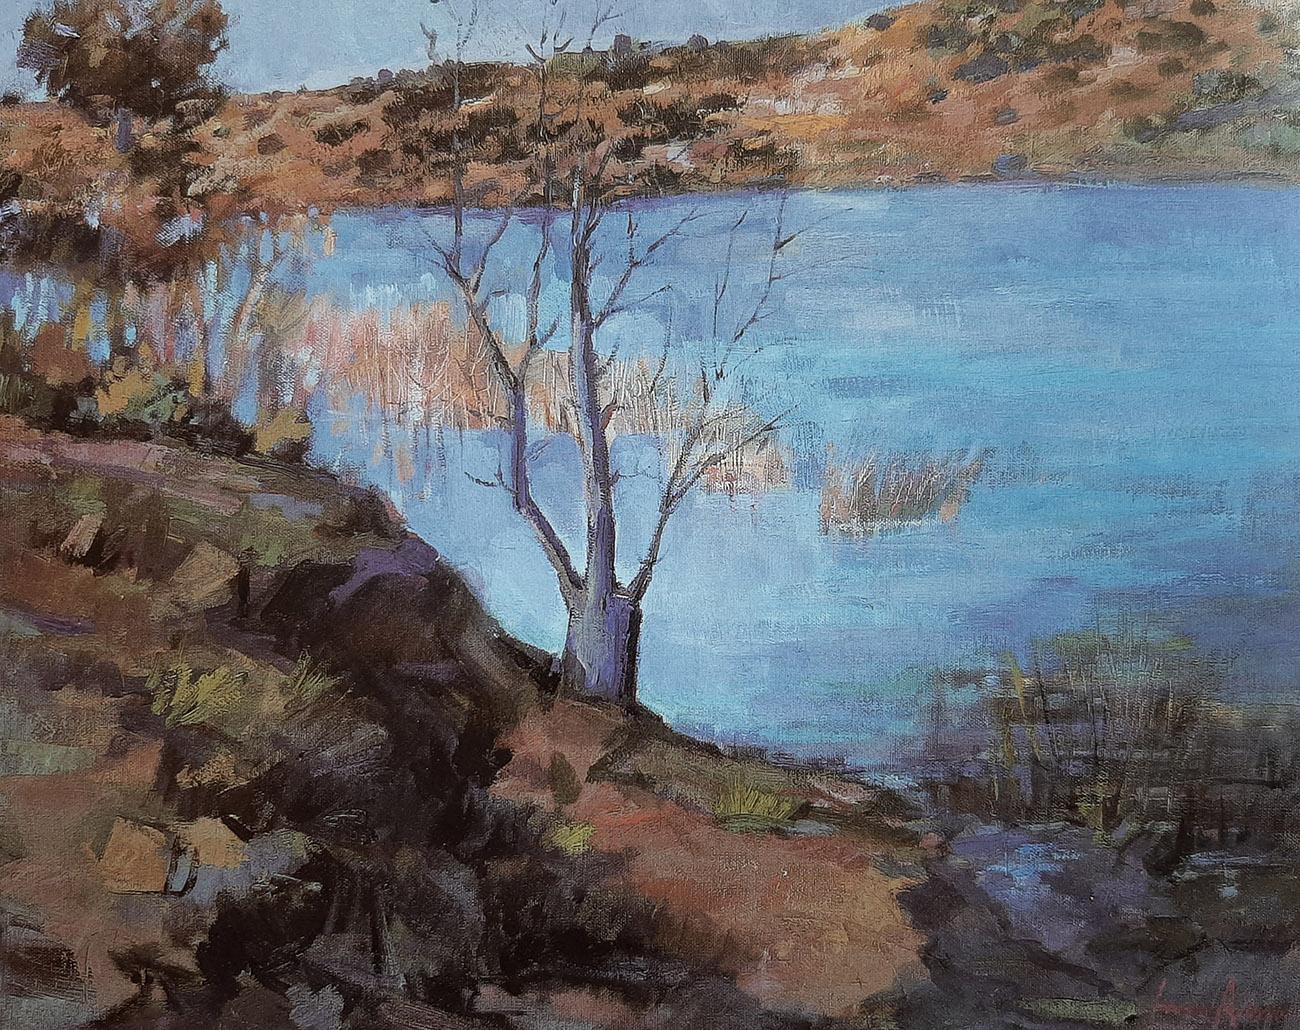 Juan Amo. (1998). Laguna de Ruidera. Óleo - Lienzo. 50 x 61. Colección Privada.